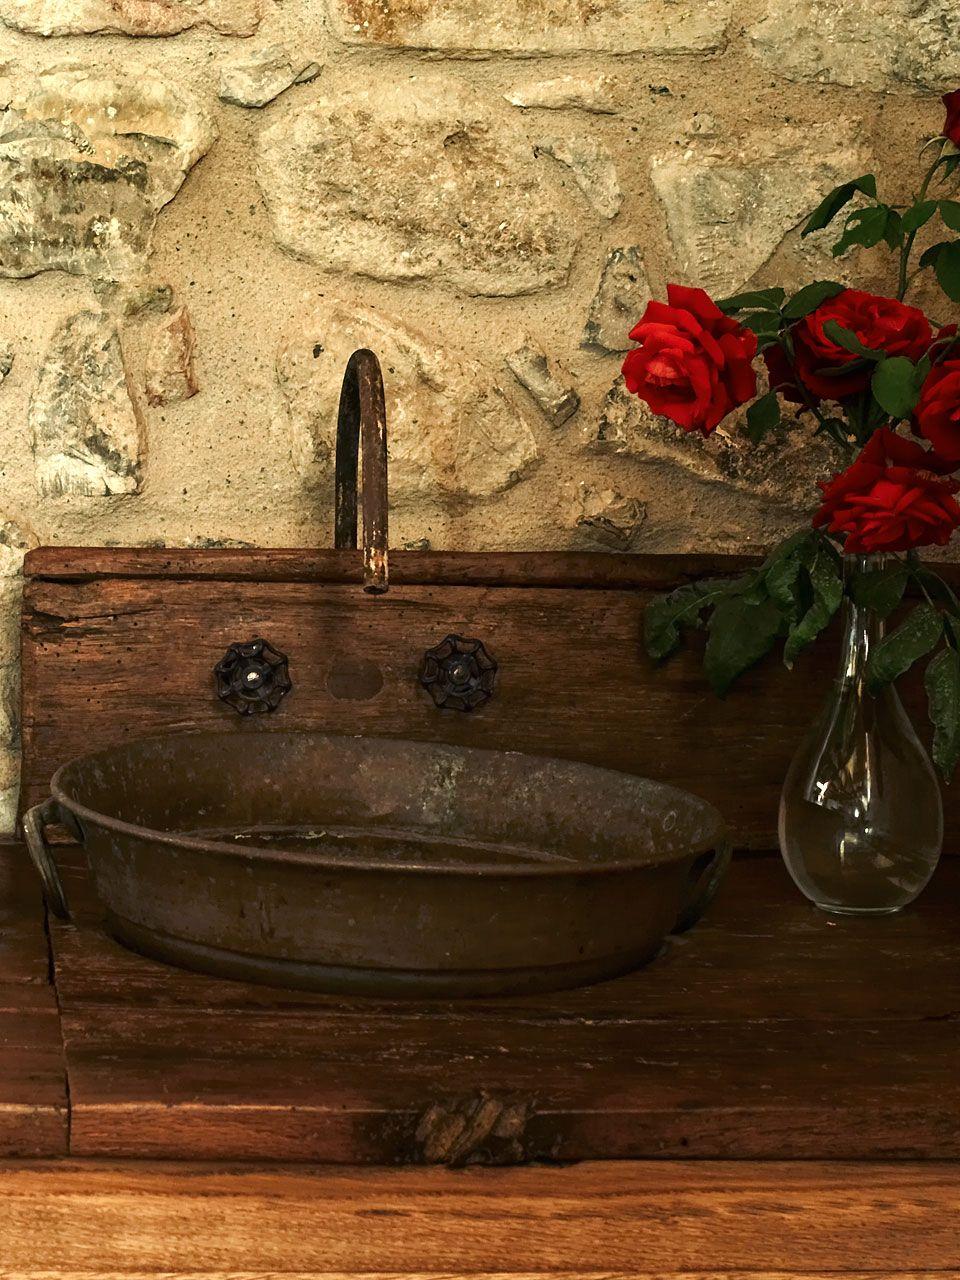 bathroom sink with a metal pan